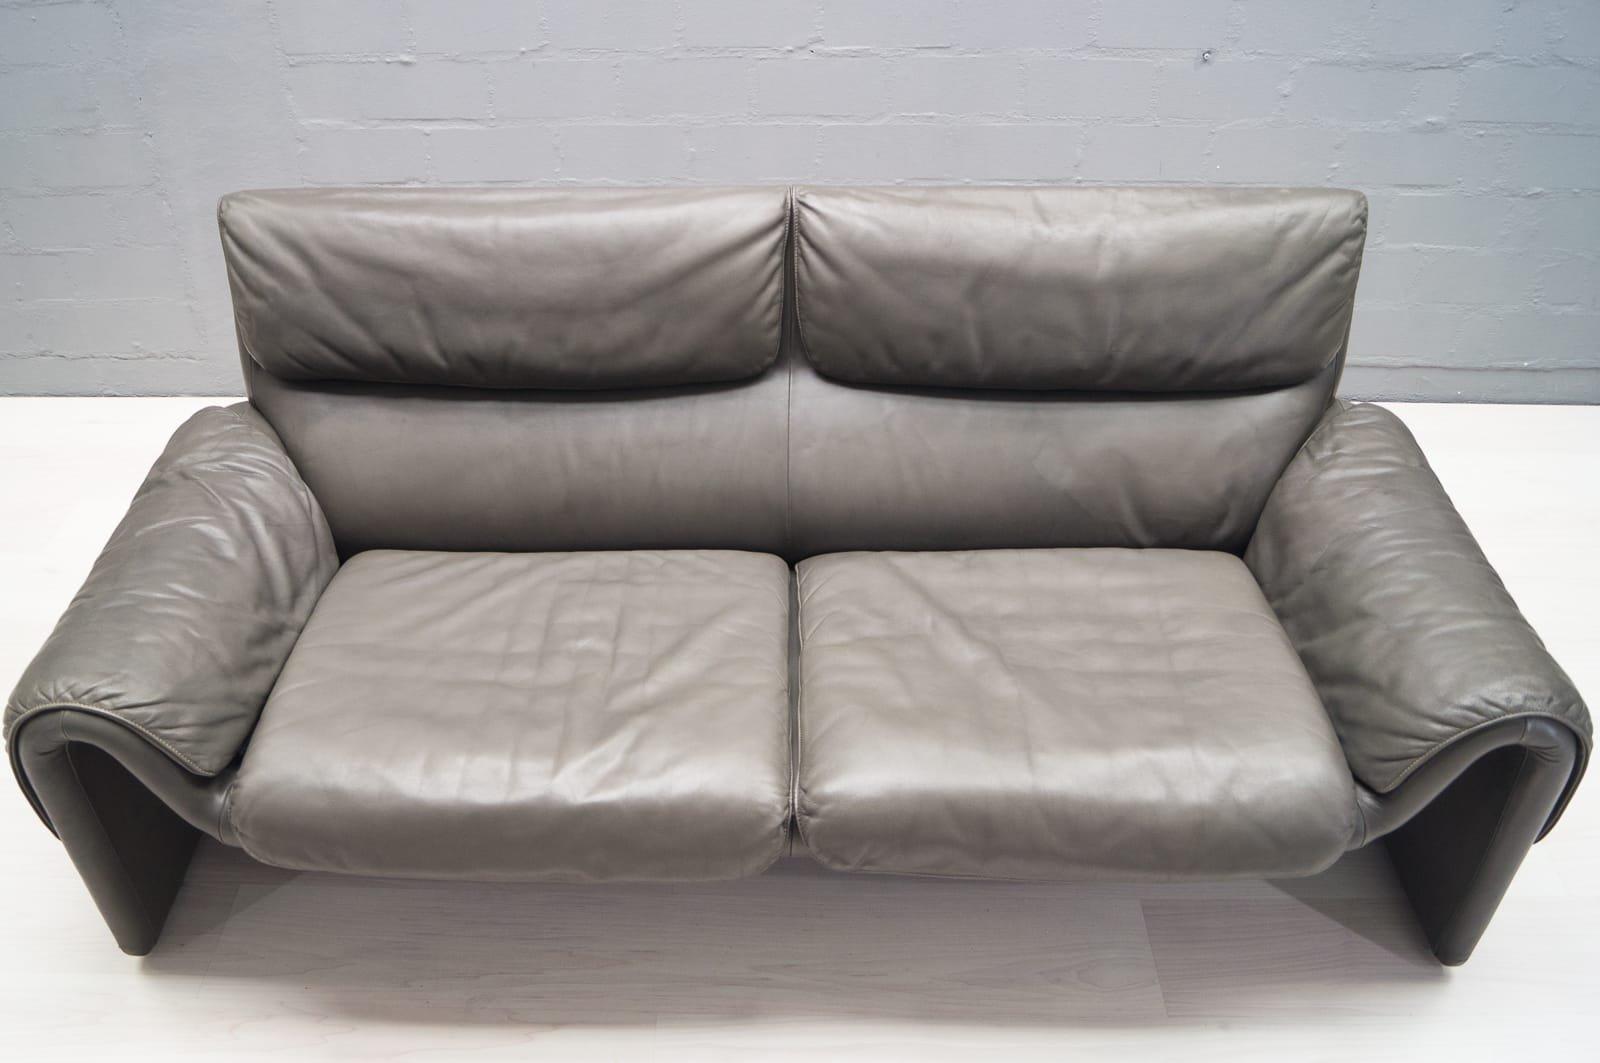 vintage modell ds 2011 ledersofa von de sede bei pamono kaufen. Black Bedroom Furniture Sets. Home Design Ideas